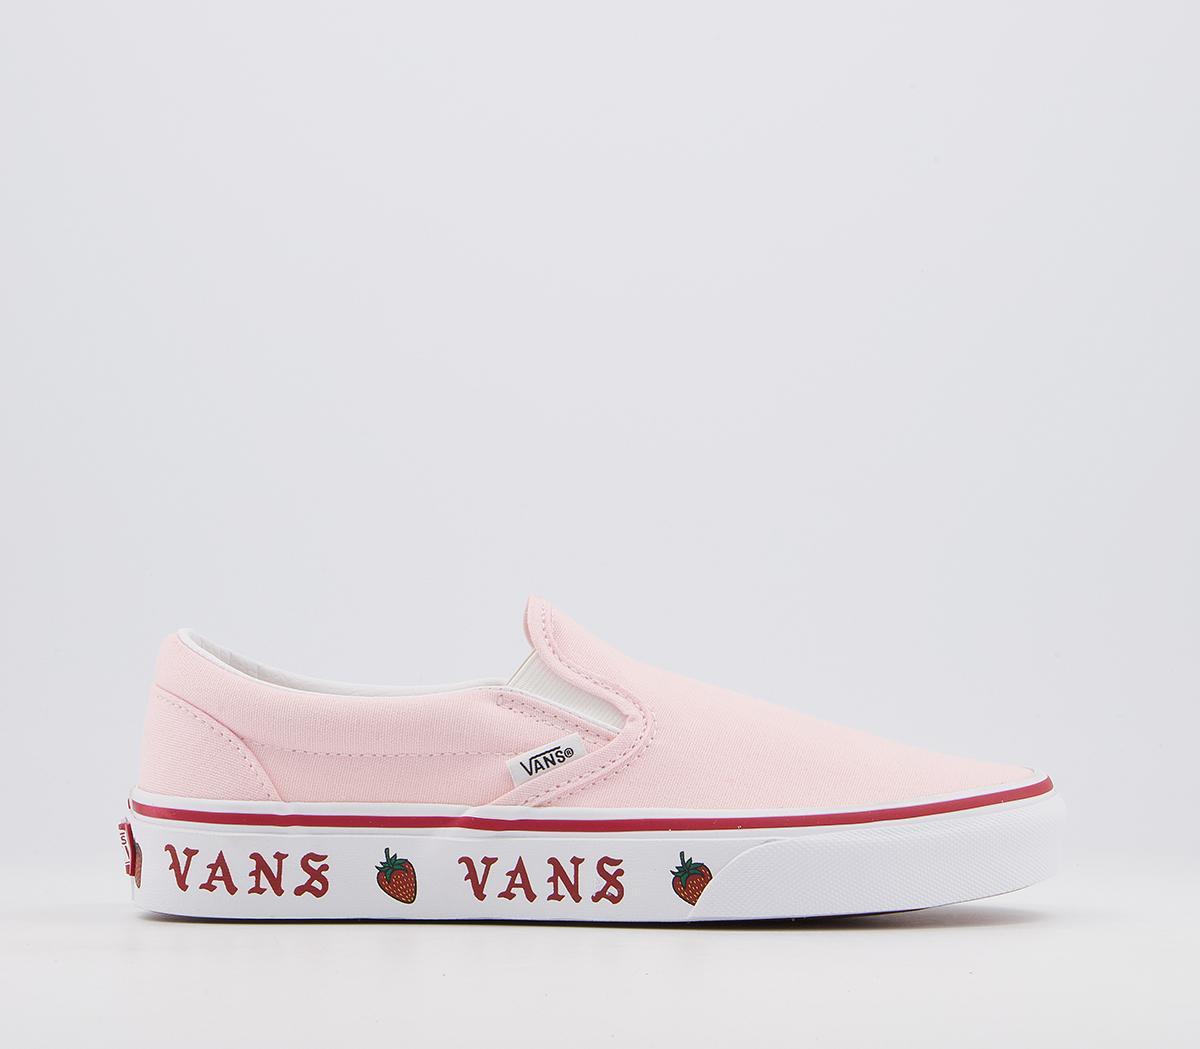 Vans Classic Slip On Trainers